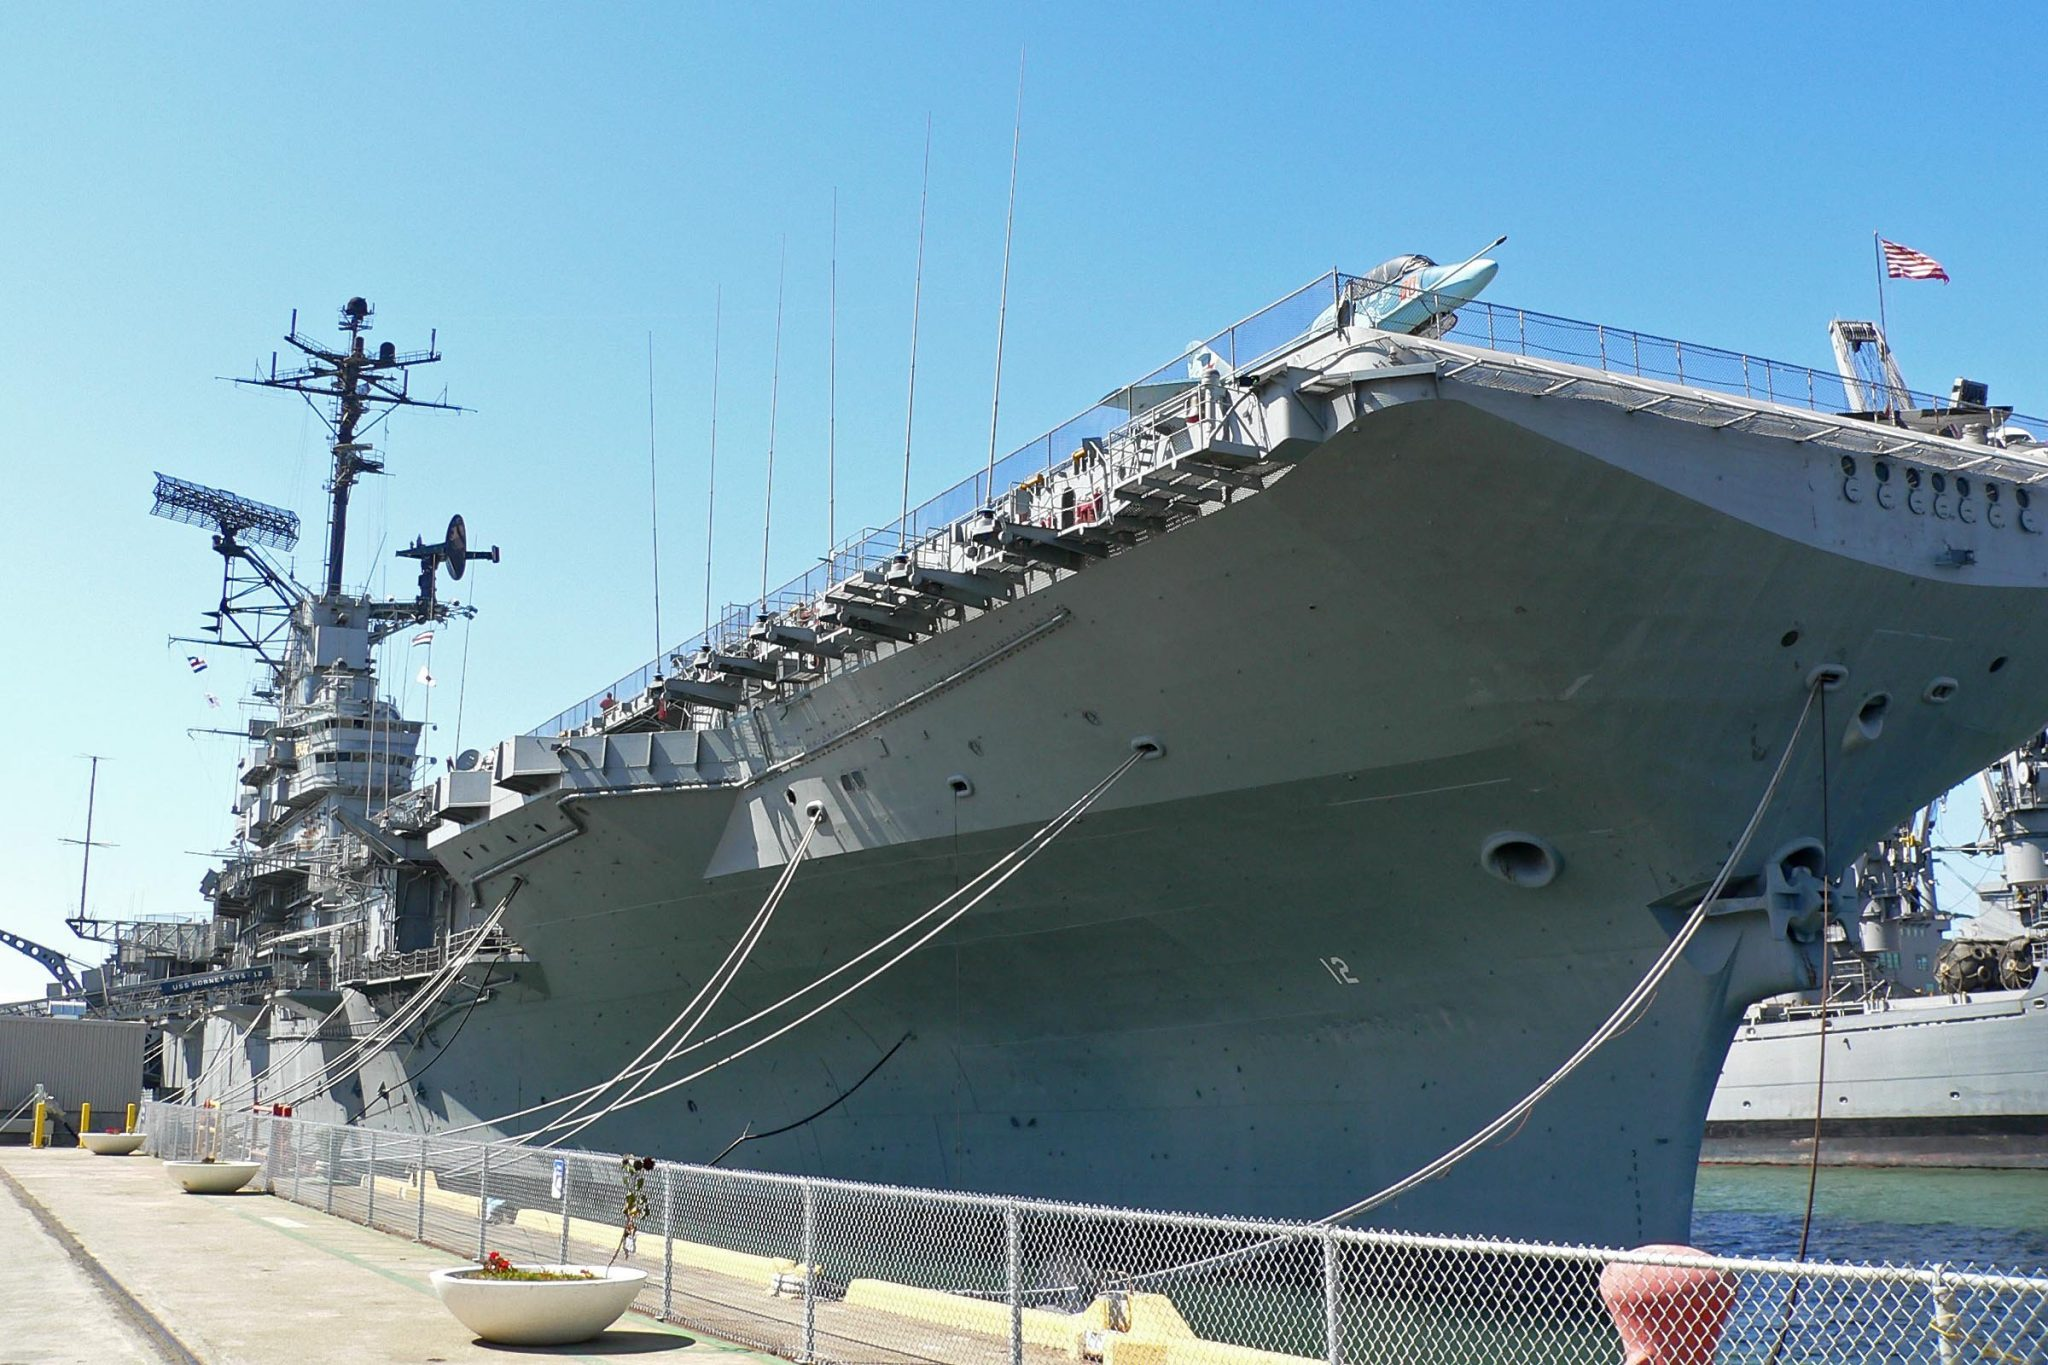 AS USS Hornet